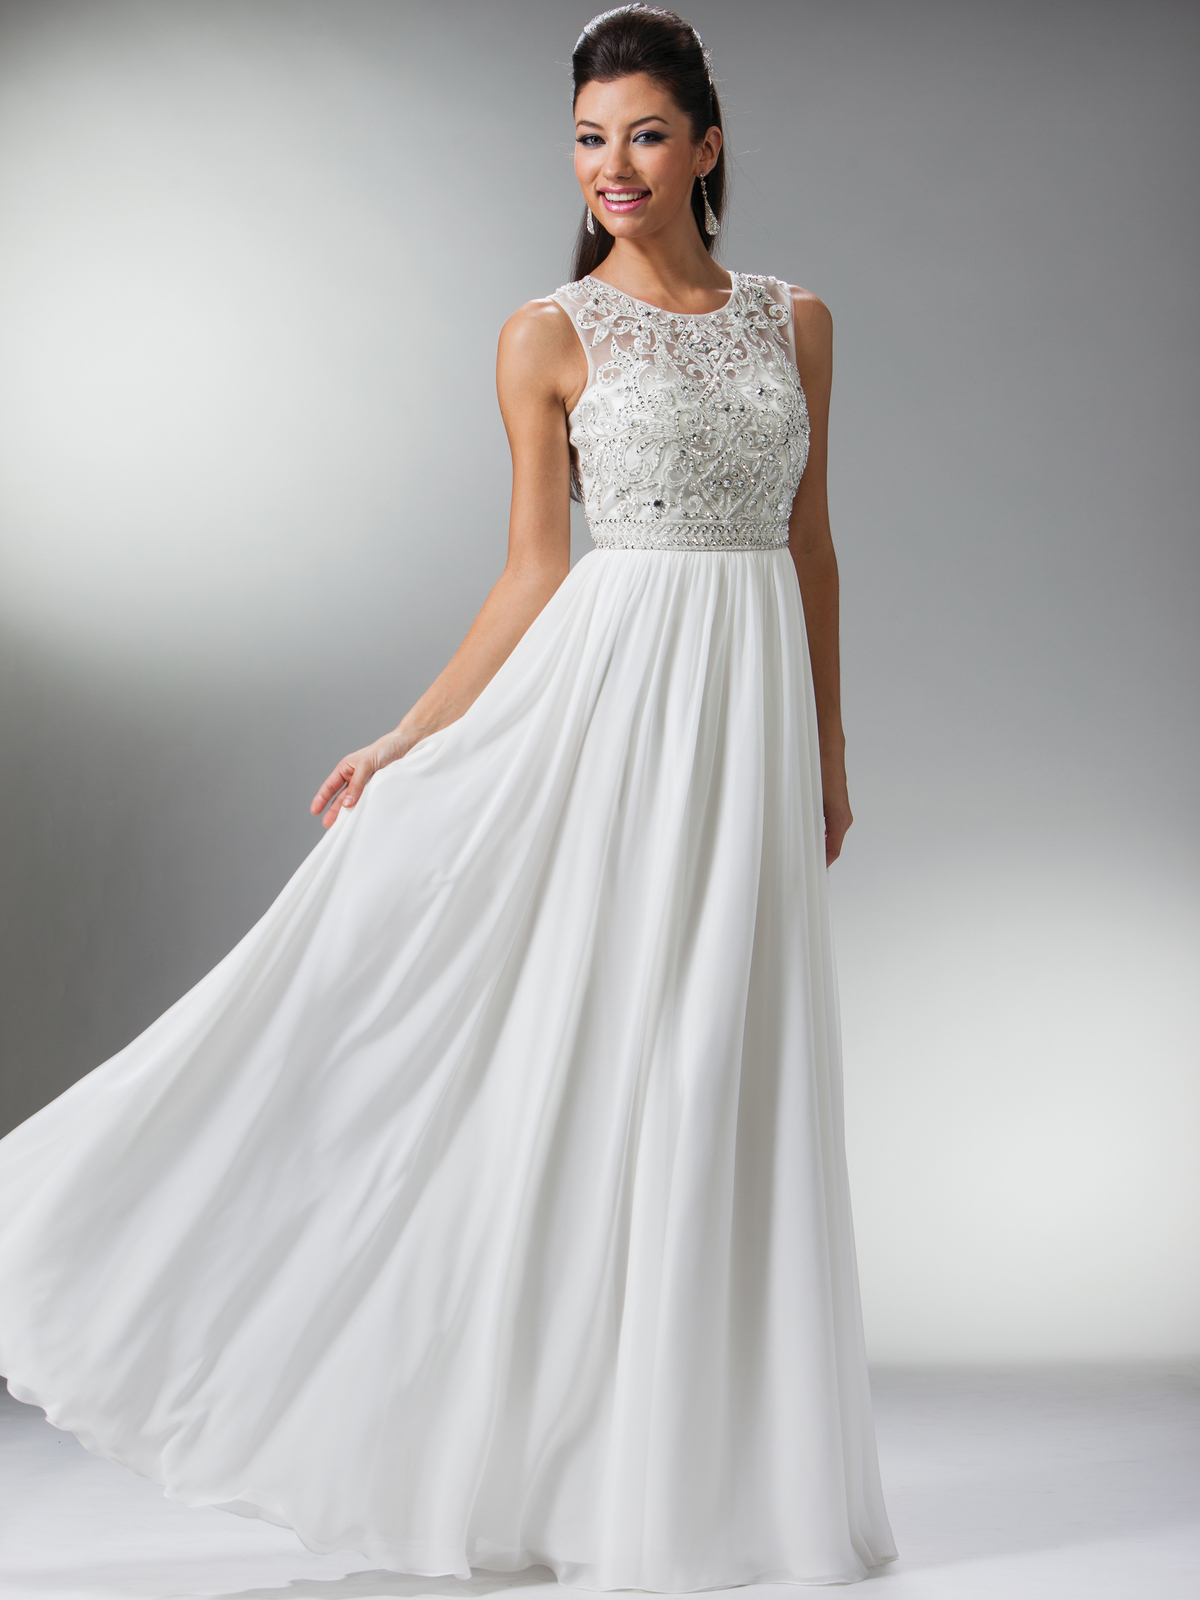 white evening dresses long photo - 1